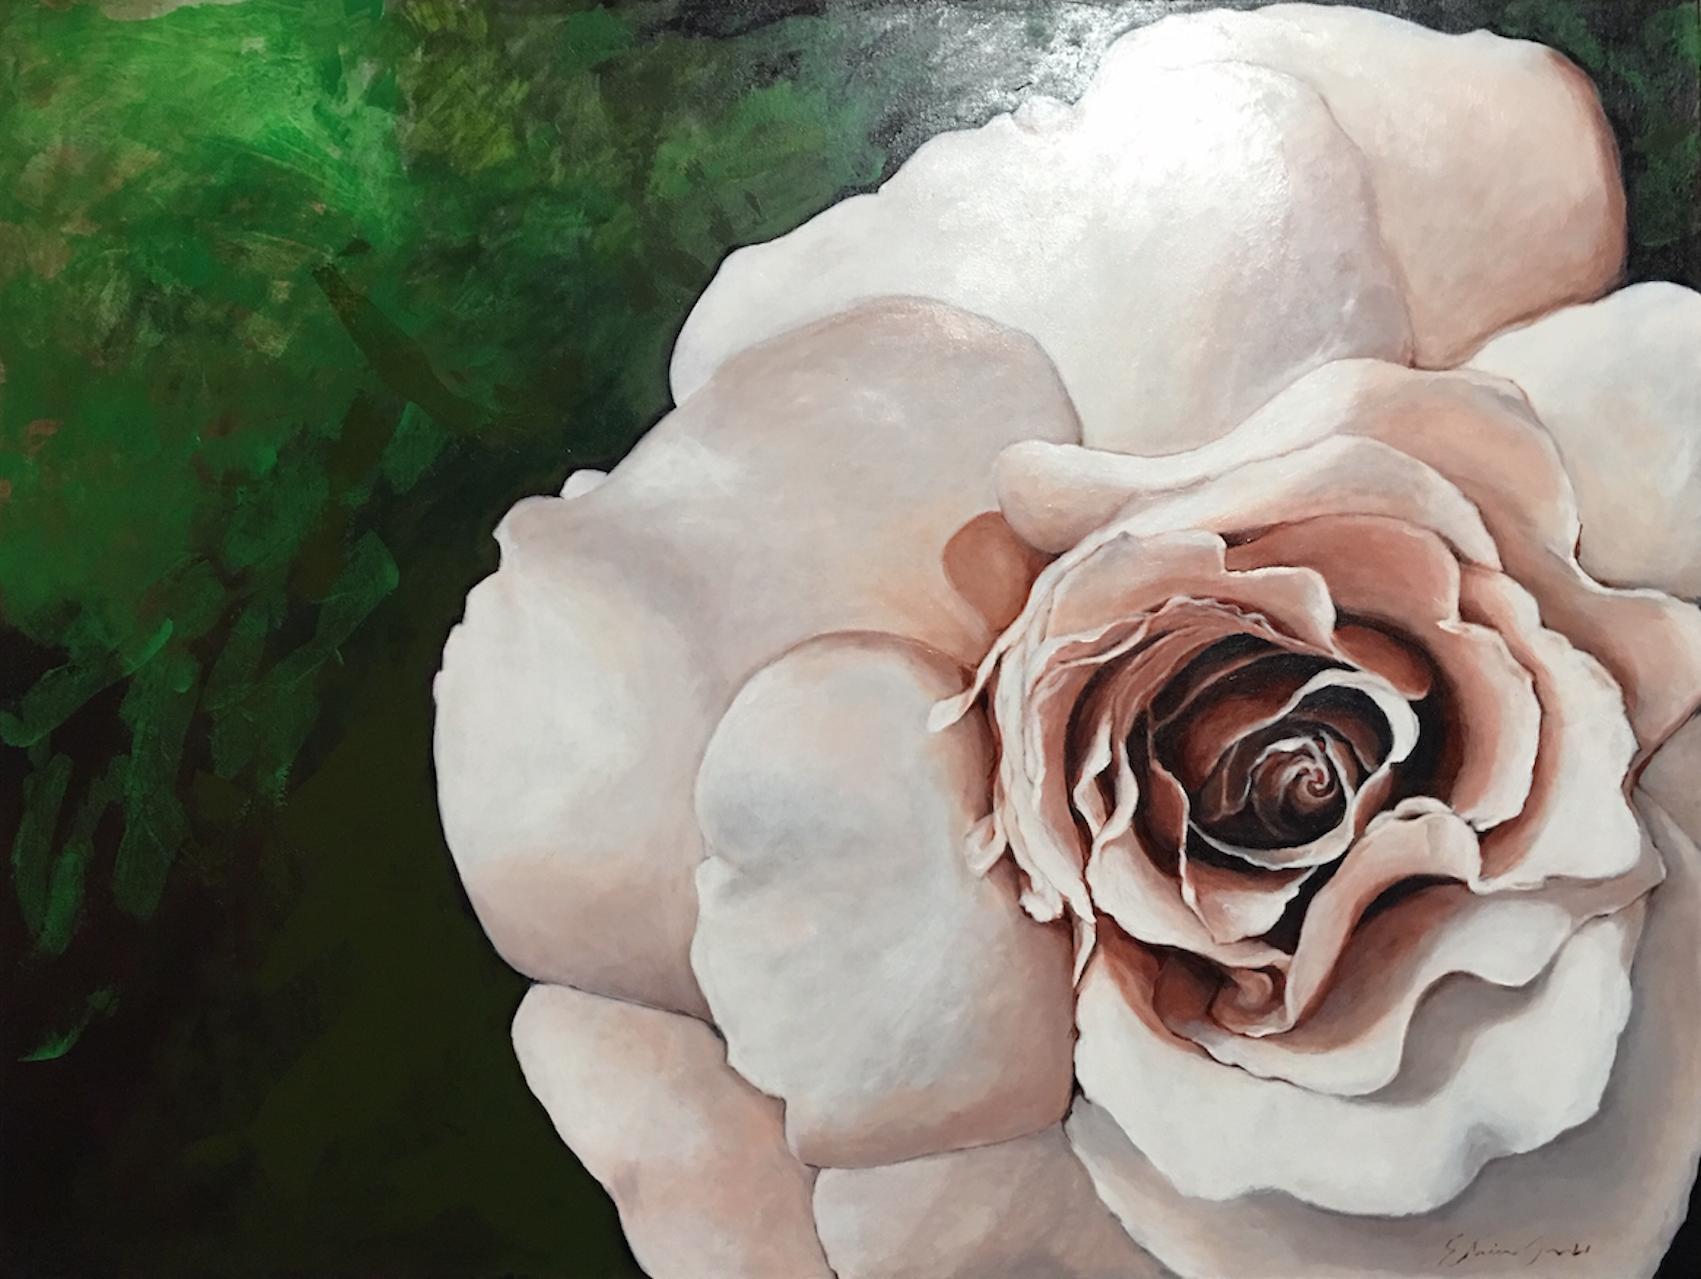 EDodd_Rose_2018_Acrylic on Canvas_75X100cm.png